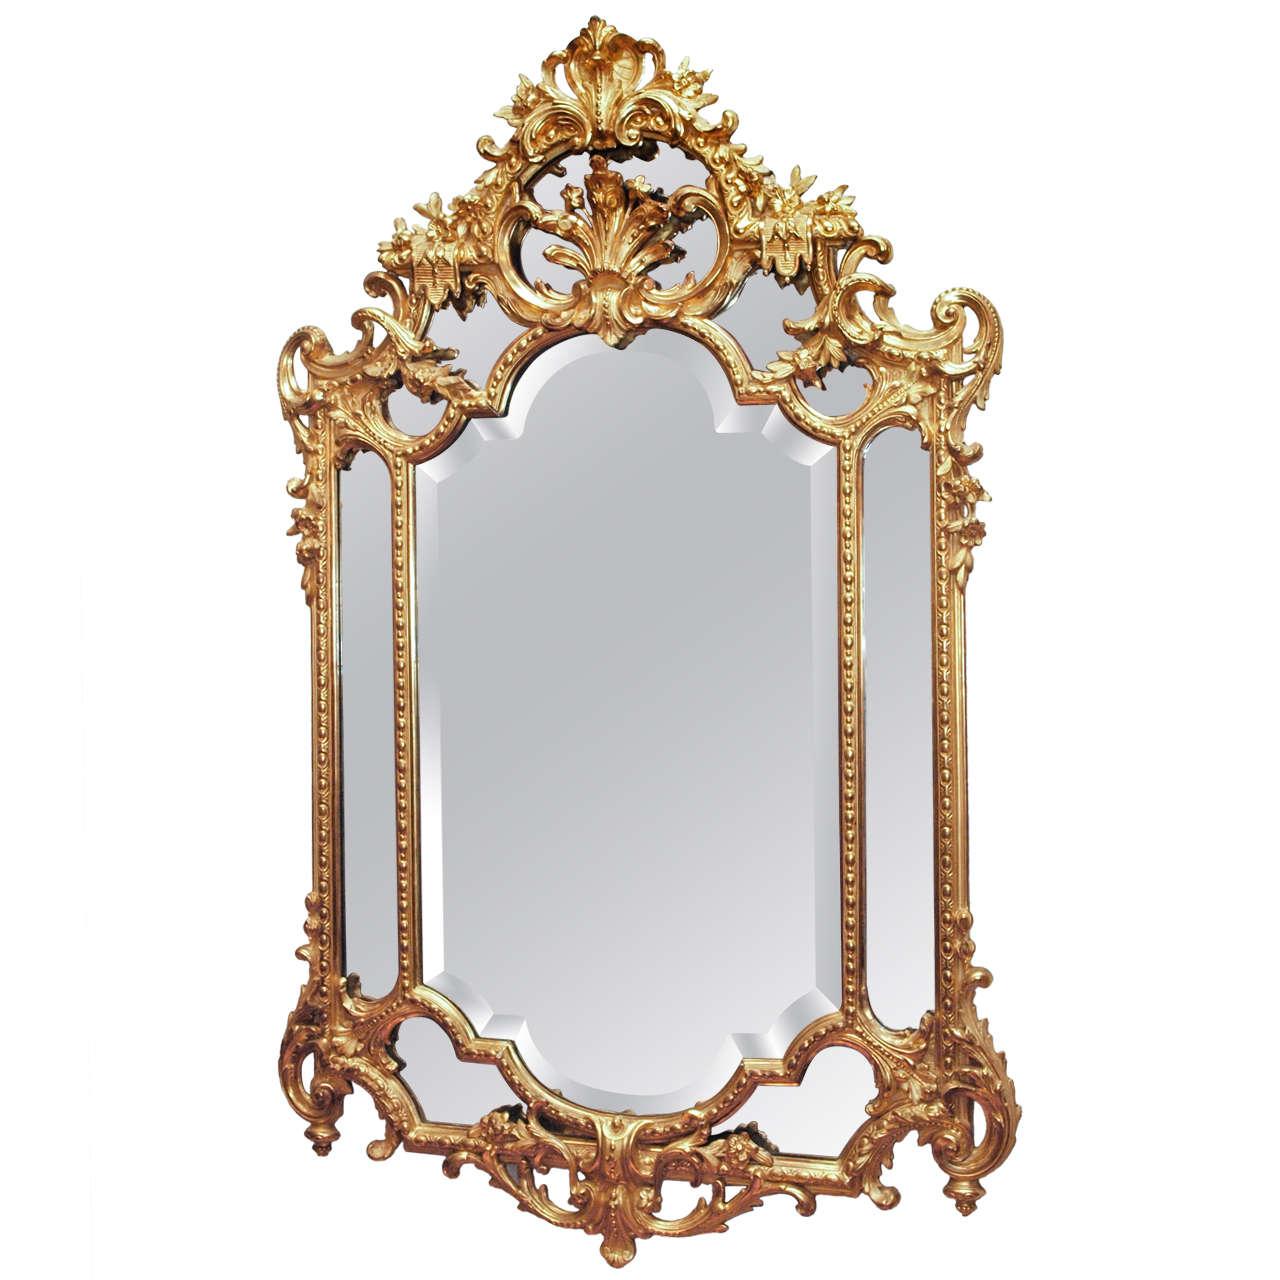 Antique Original Gold Leaf Mirror Circa 1880 At 1stdibs